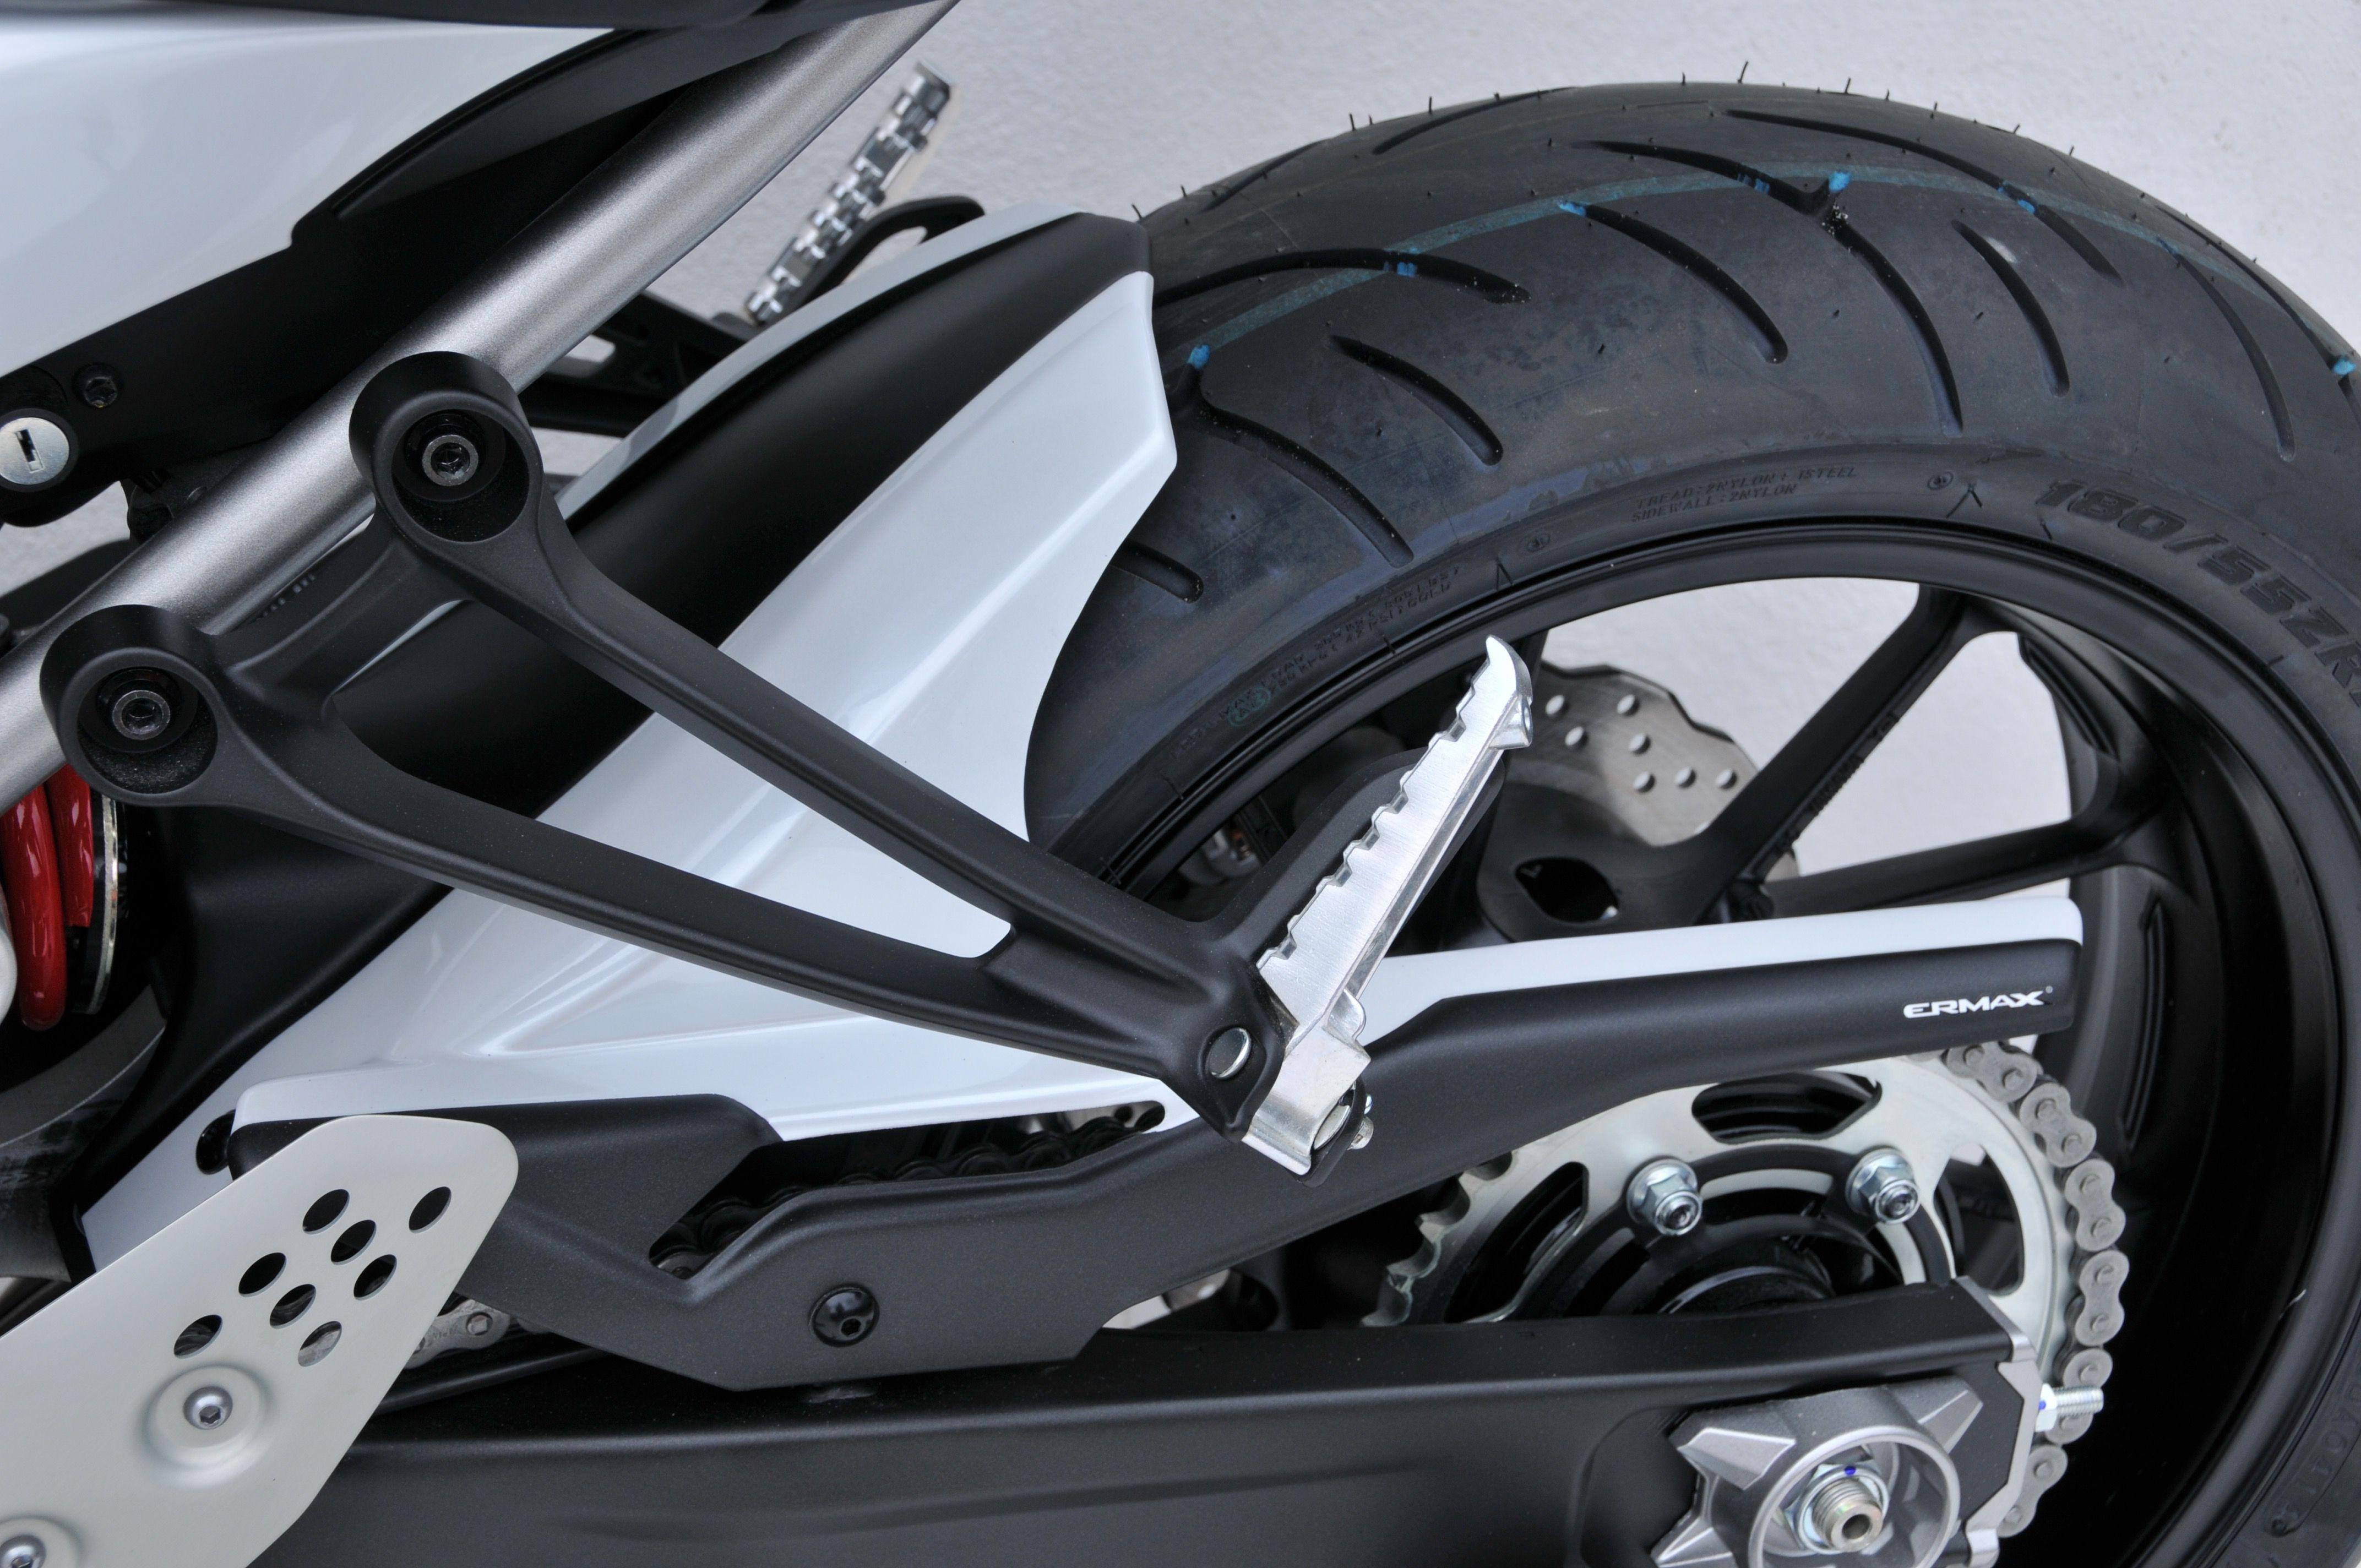 Twin Colors Rear Hugger Yamaha Mt07 Fz7 2015 2017 By Ermax Design Honda Motorcycles Accessories Motorcycle Custom Bikes